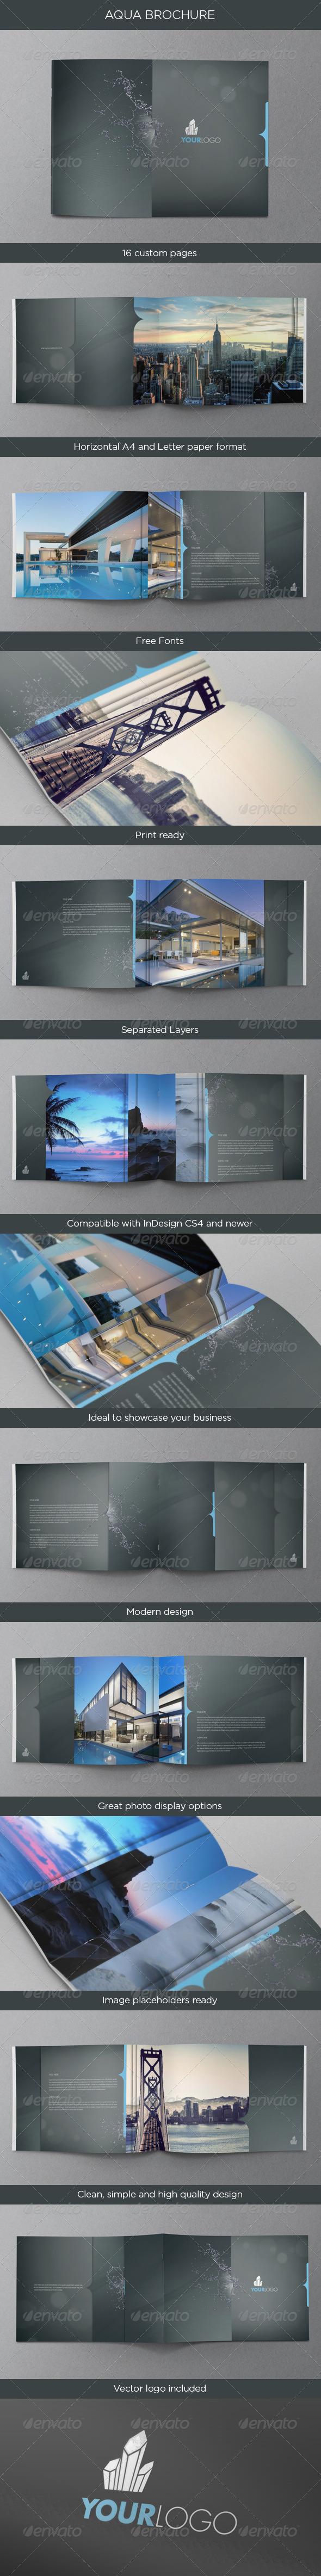 GraphicRiver Aqua Premium Brochure 4646509